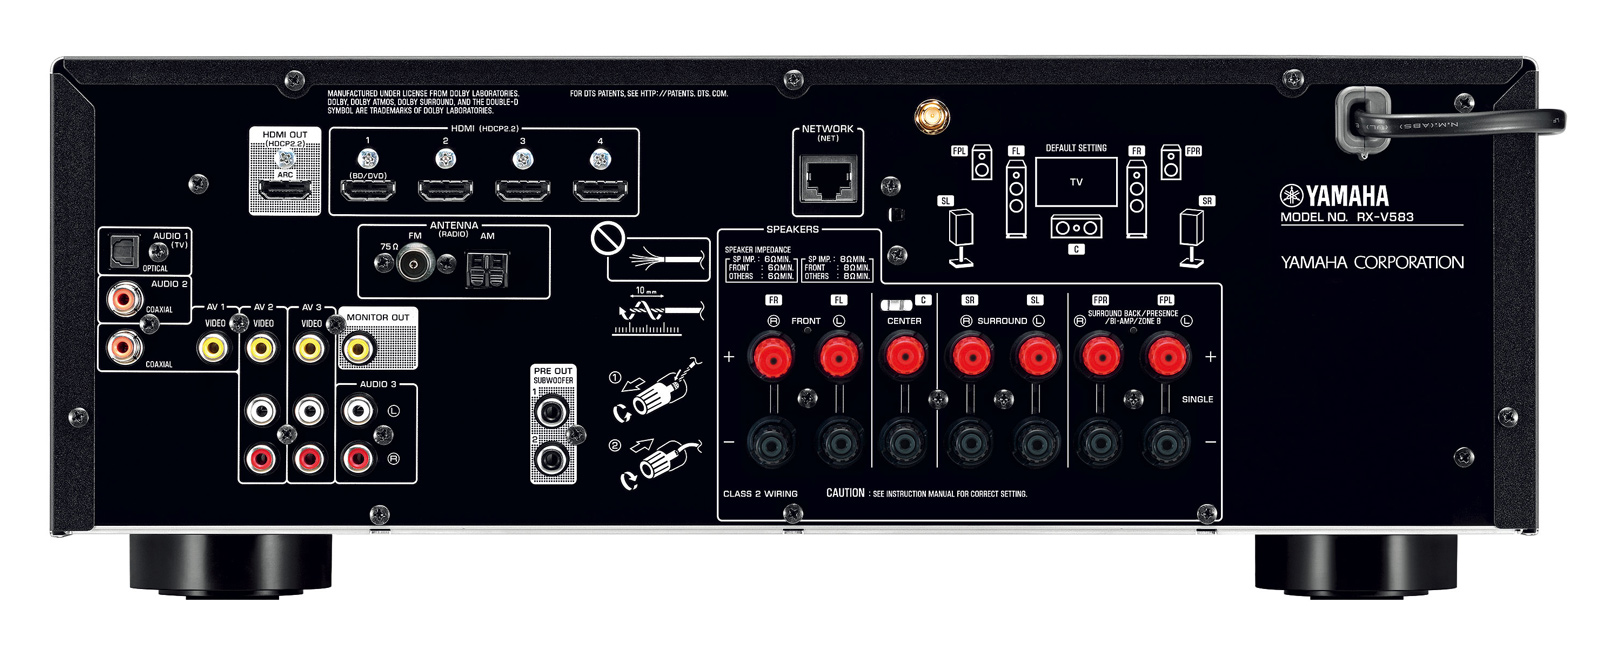 Bluetooth Yamaha Rx V